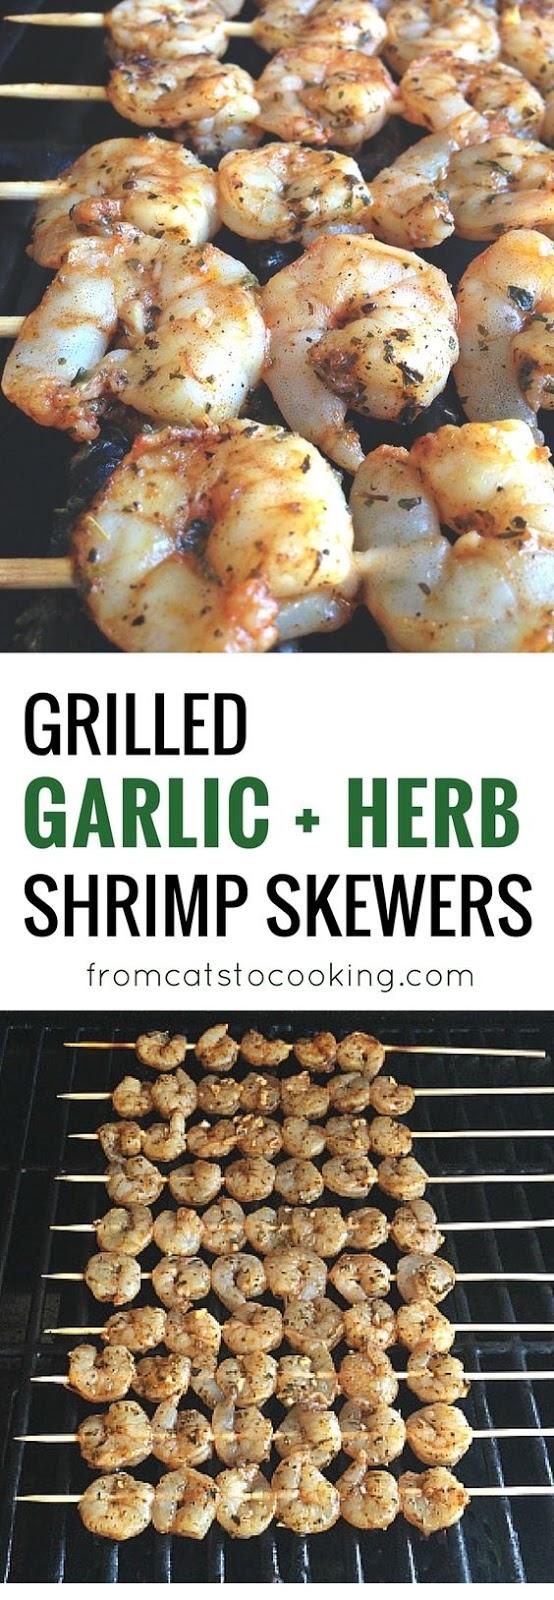 Grilled Garlic Herb Shrimp Skewers